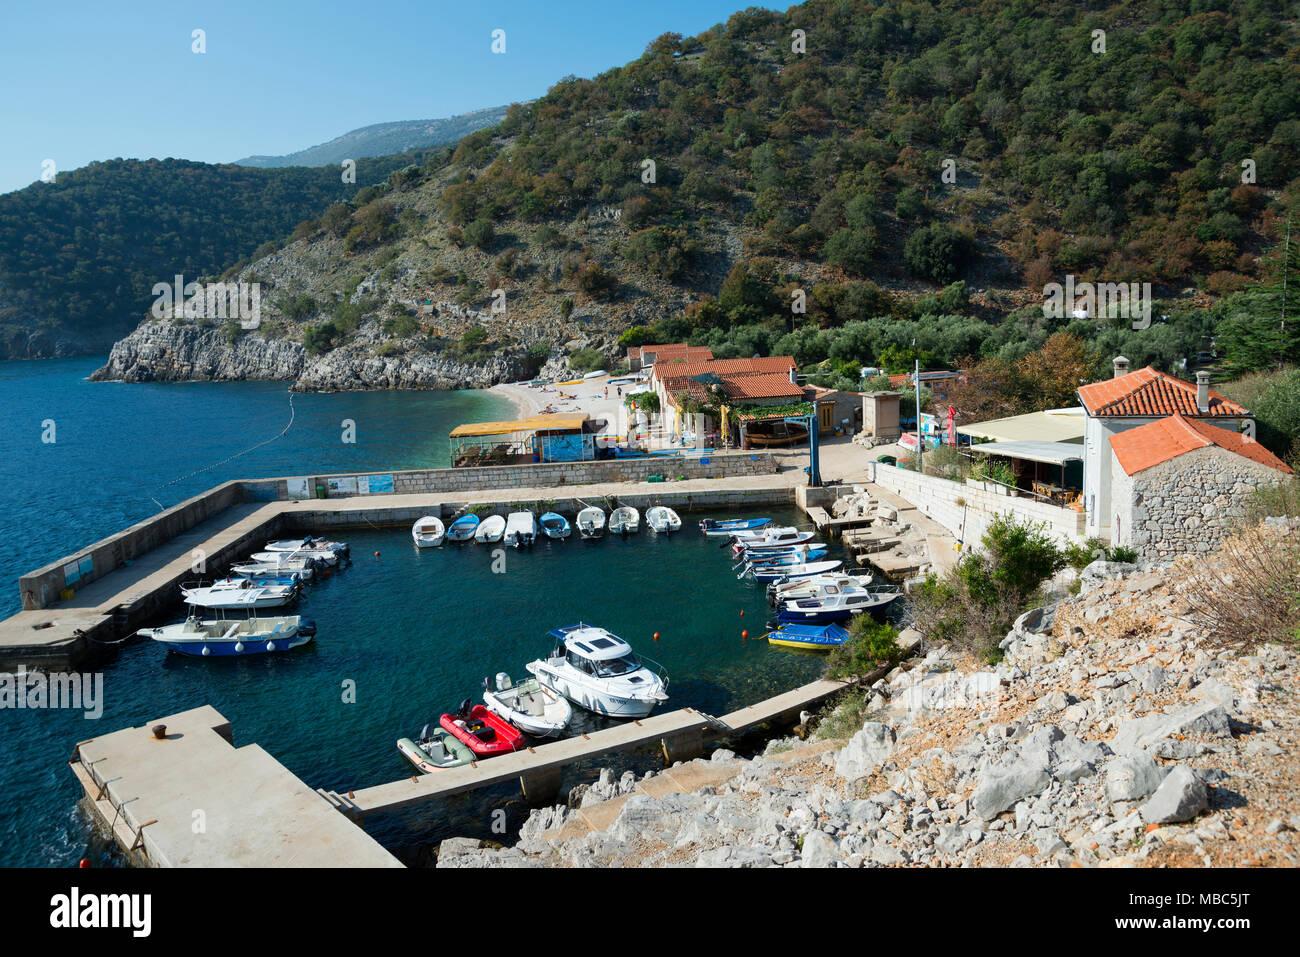 Port, Beli, Cres Island, Kvarner Gulf Bay, Croatia - Stock Image